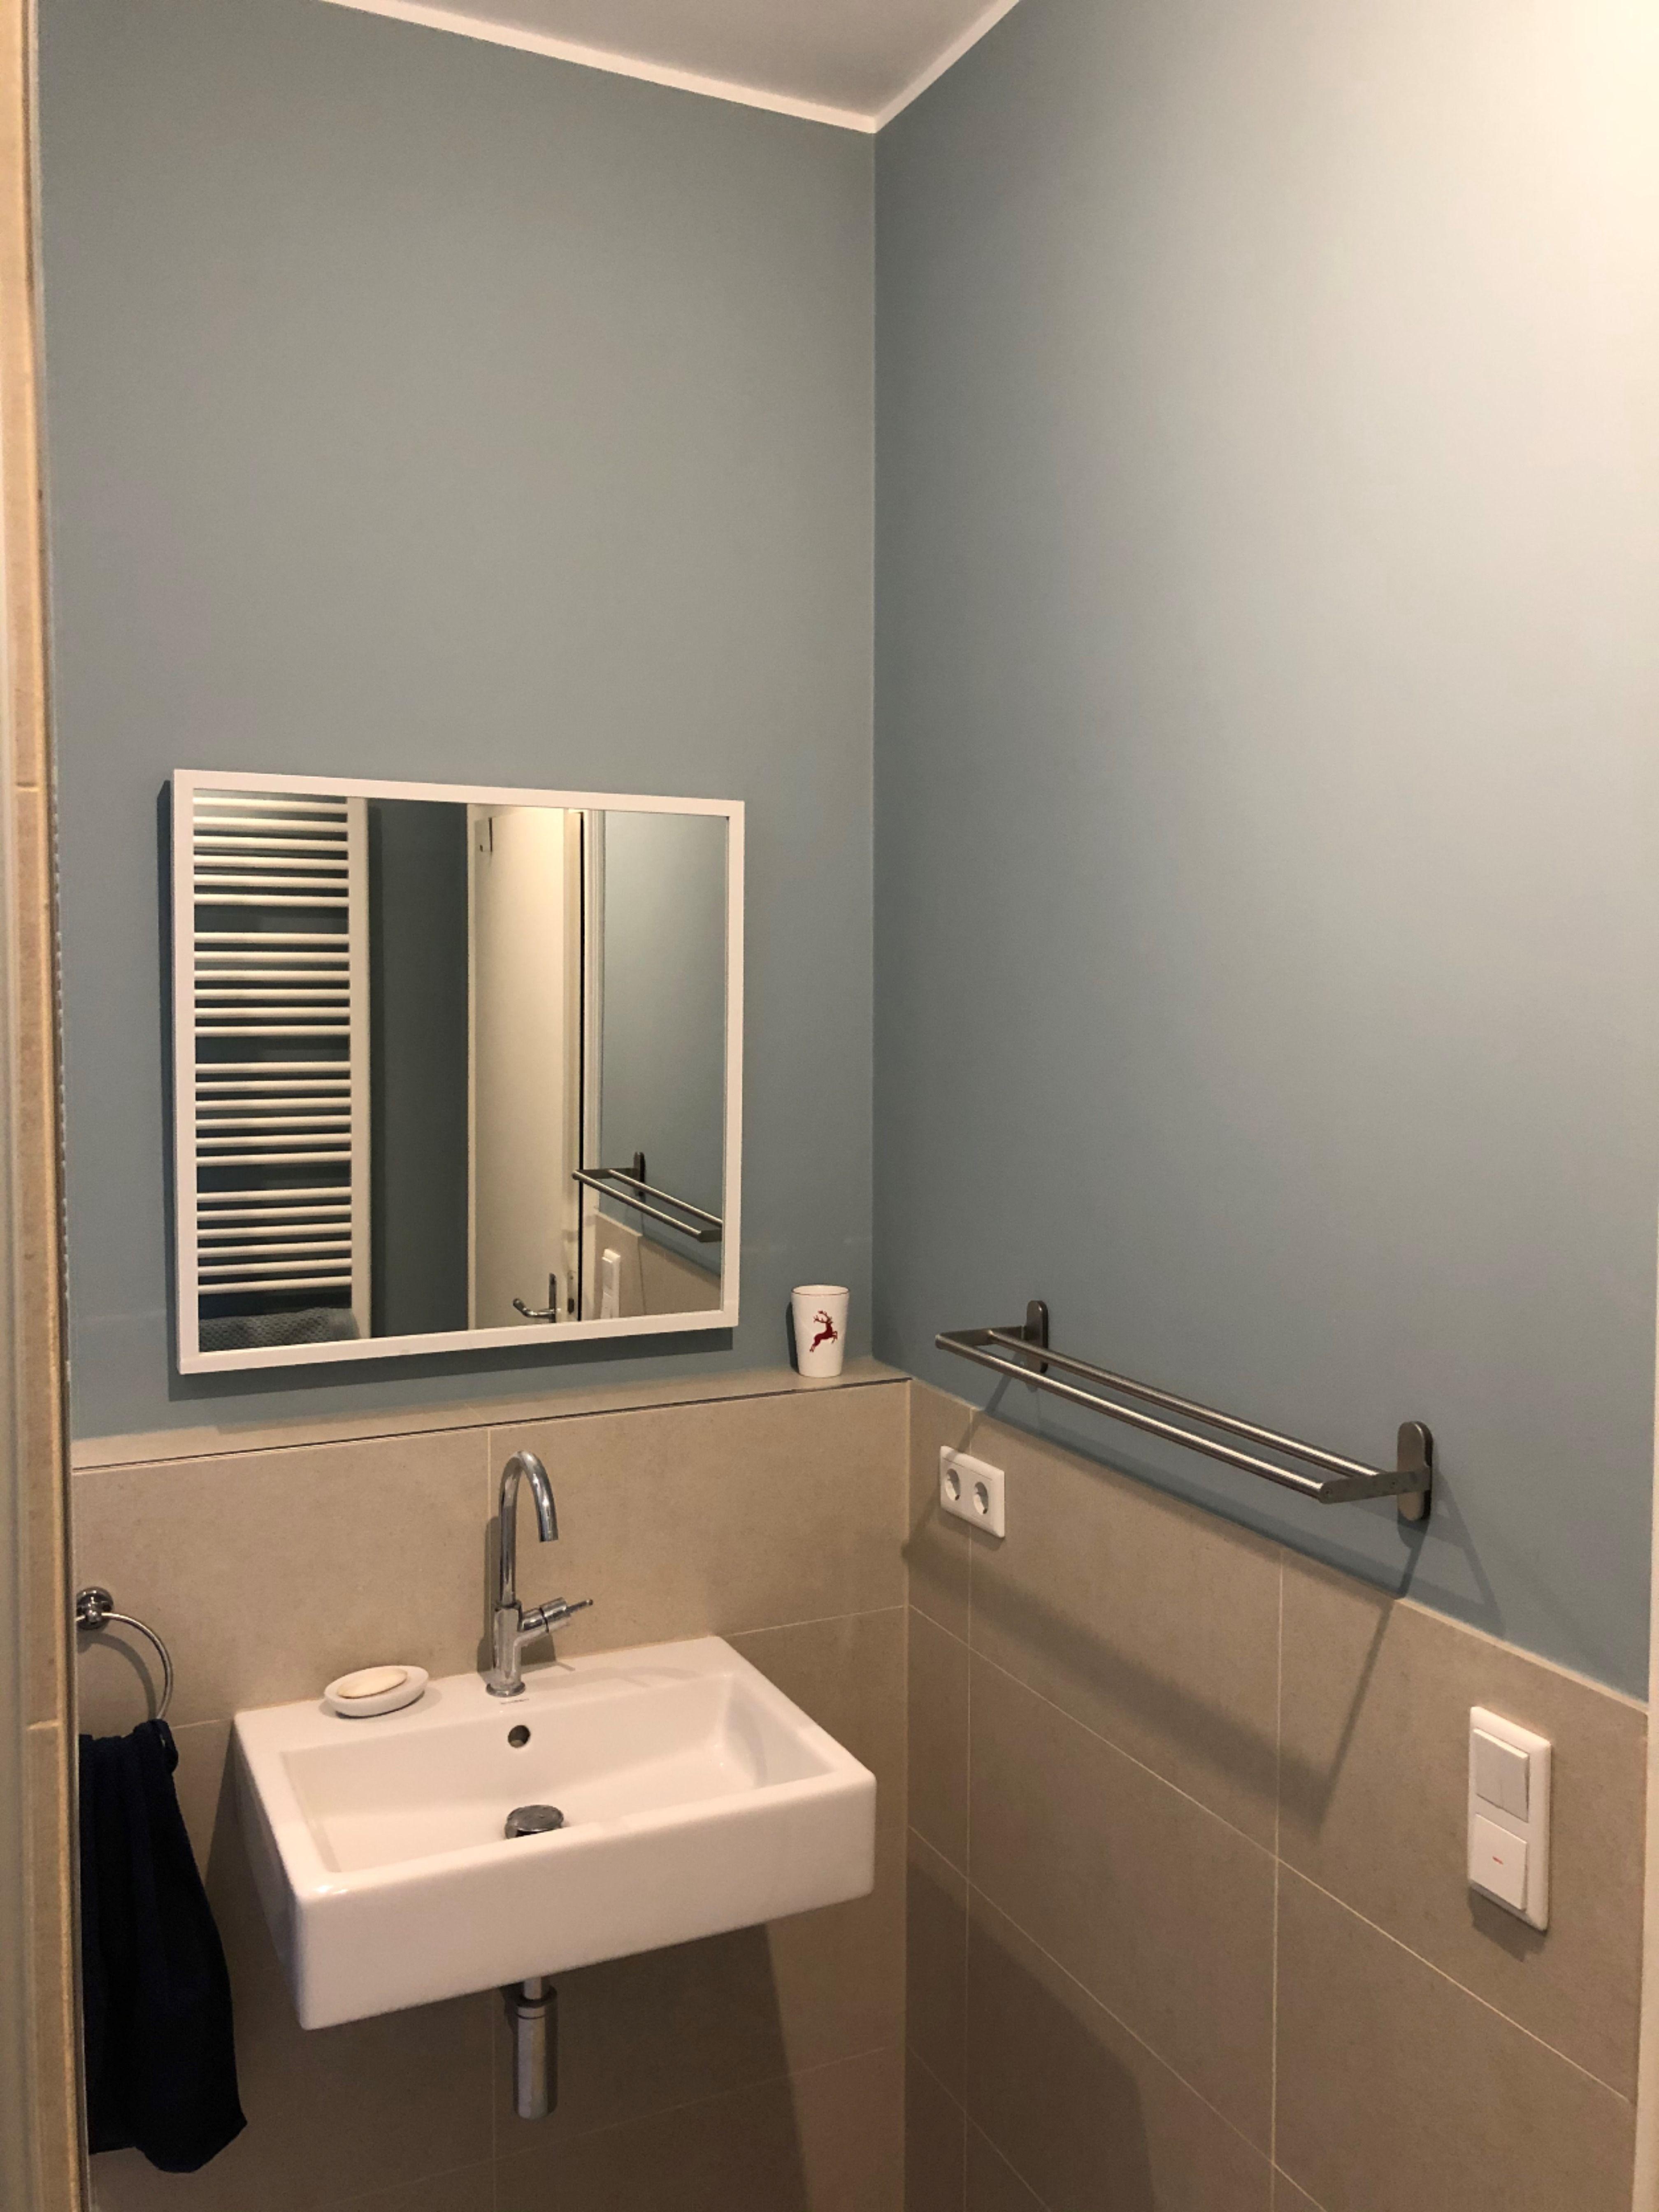 Niagara 055 In 2020 Badezimmer Farben Blaue Wand Kreidefarbe